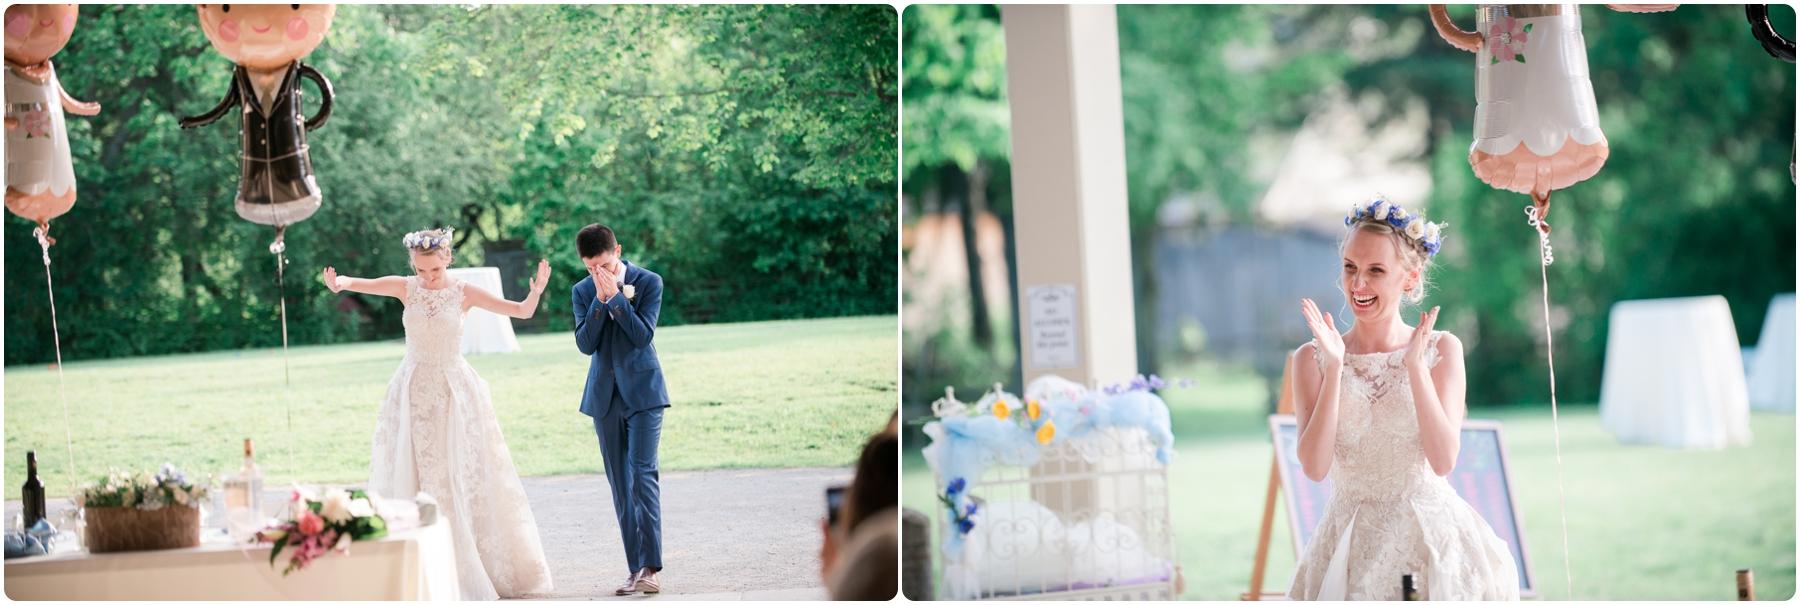 Black Creek Pioneer Village Wedding- Agata & Chris_0255